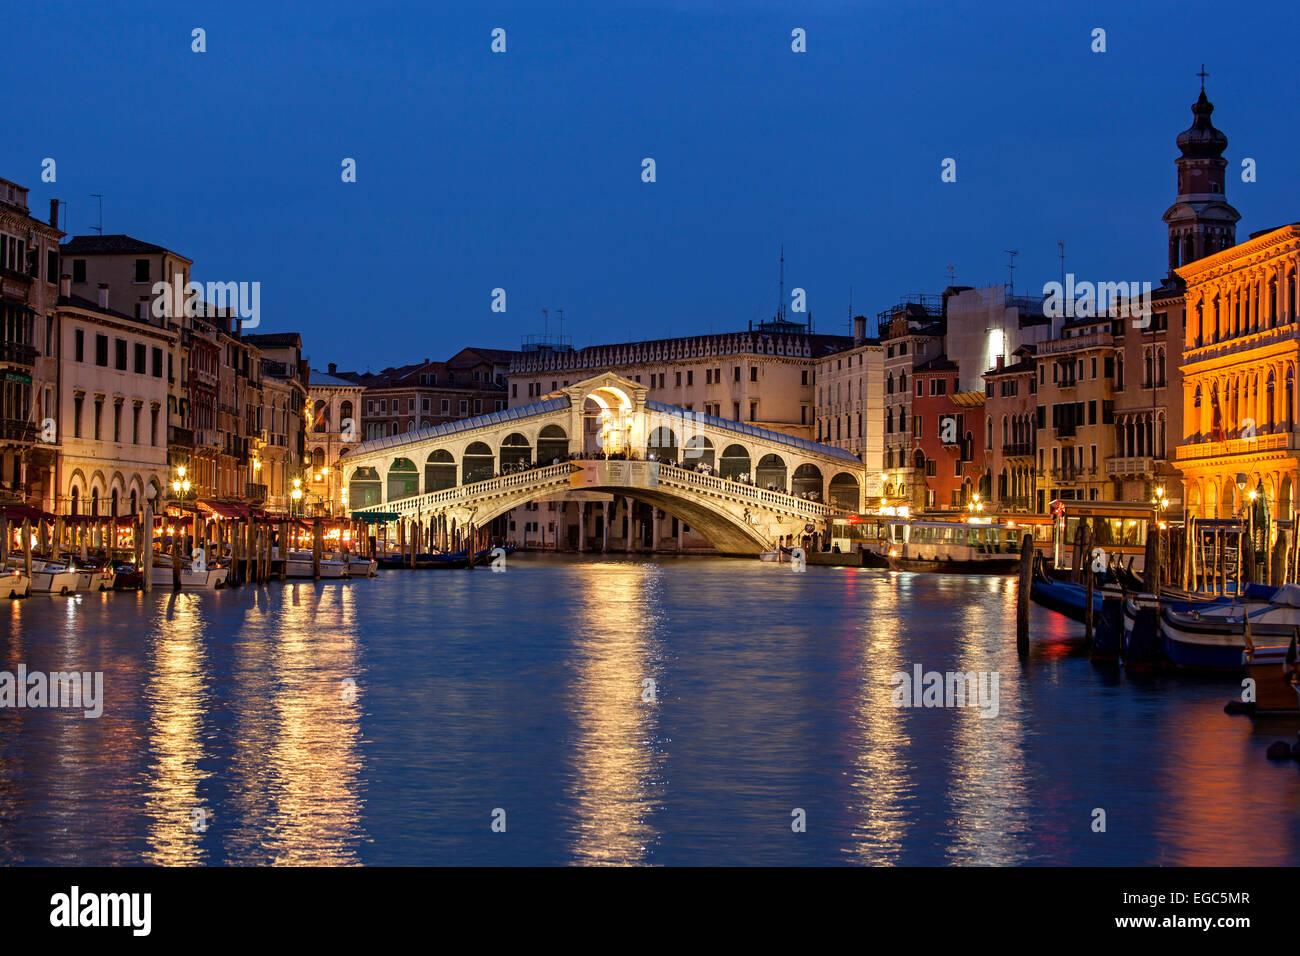 Rialto Bridge, Grand Canal, Venice, Italy - Stock Image